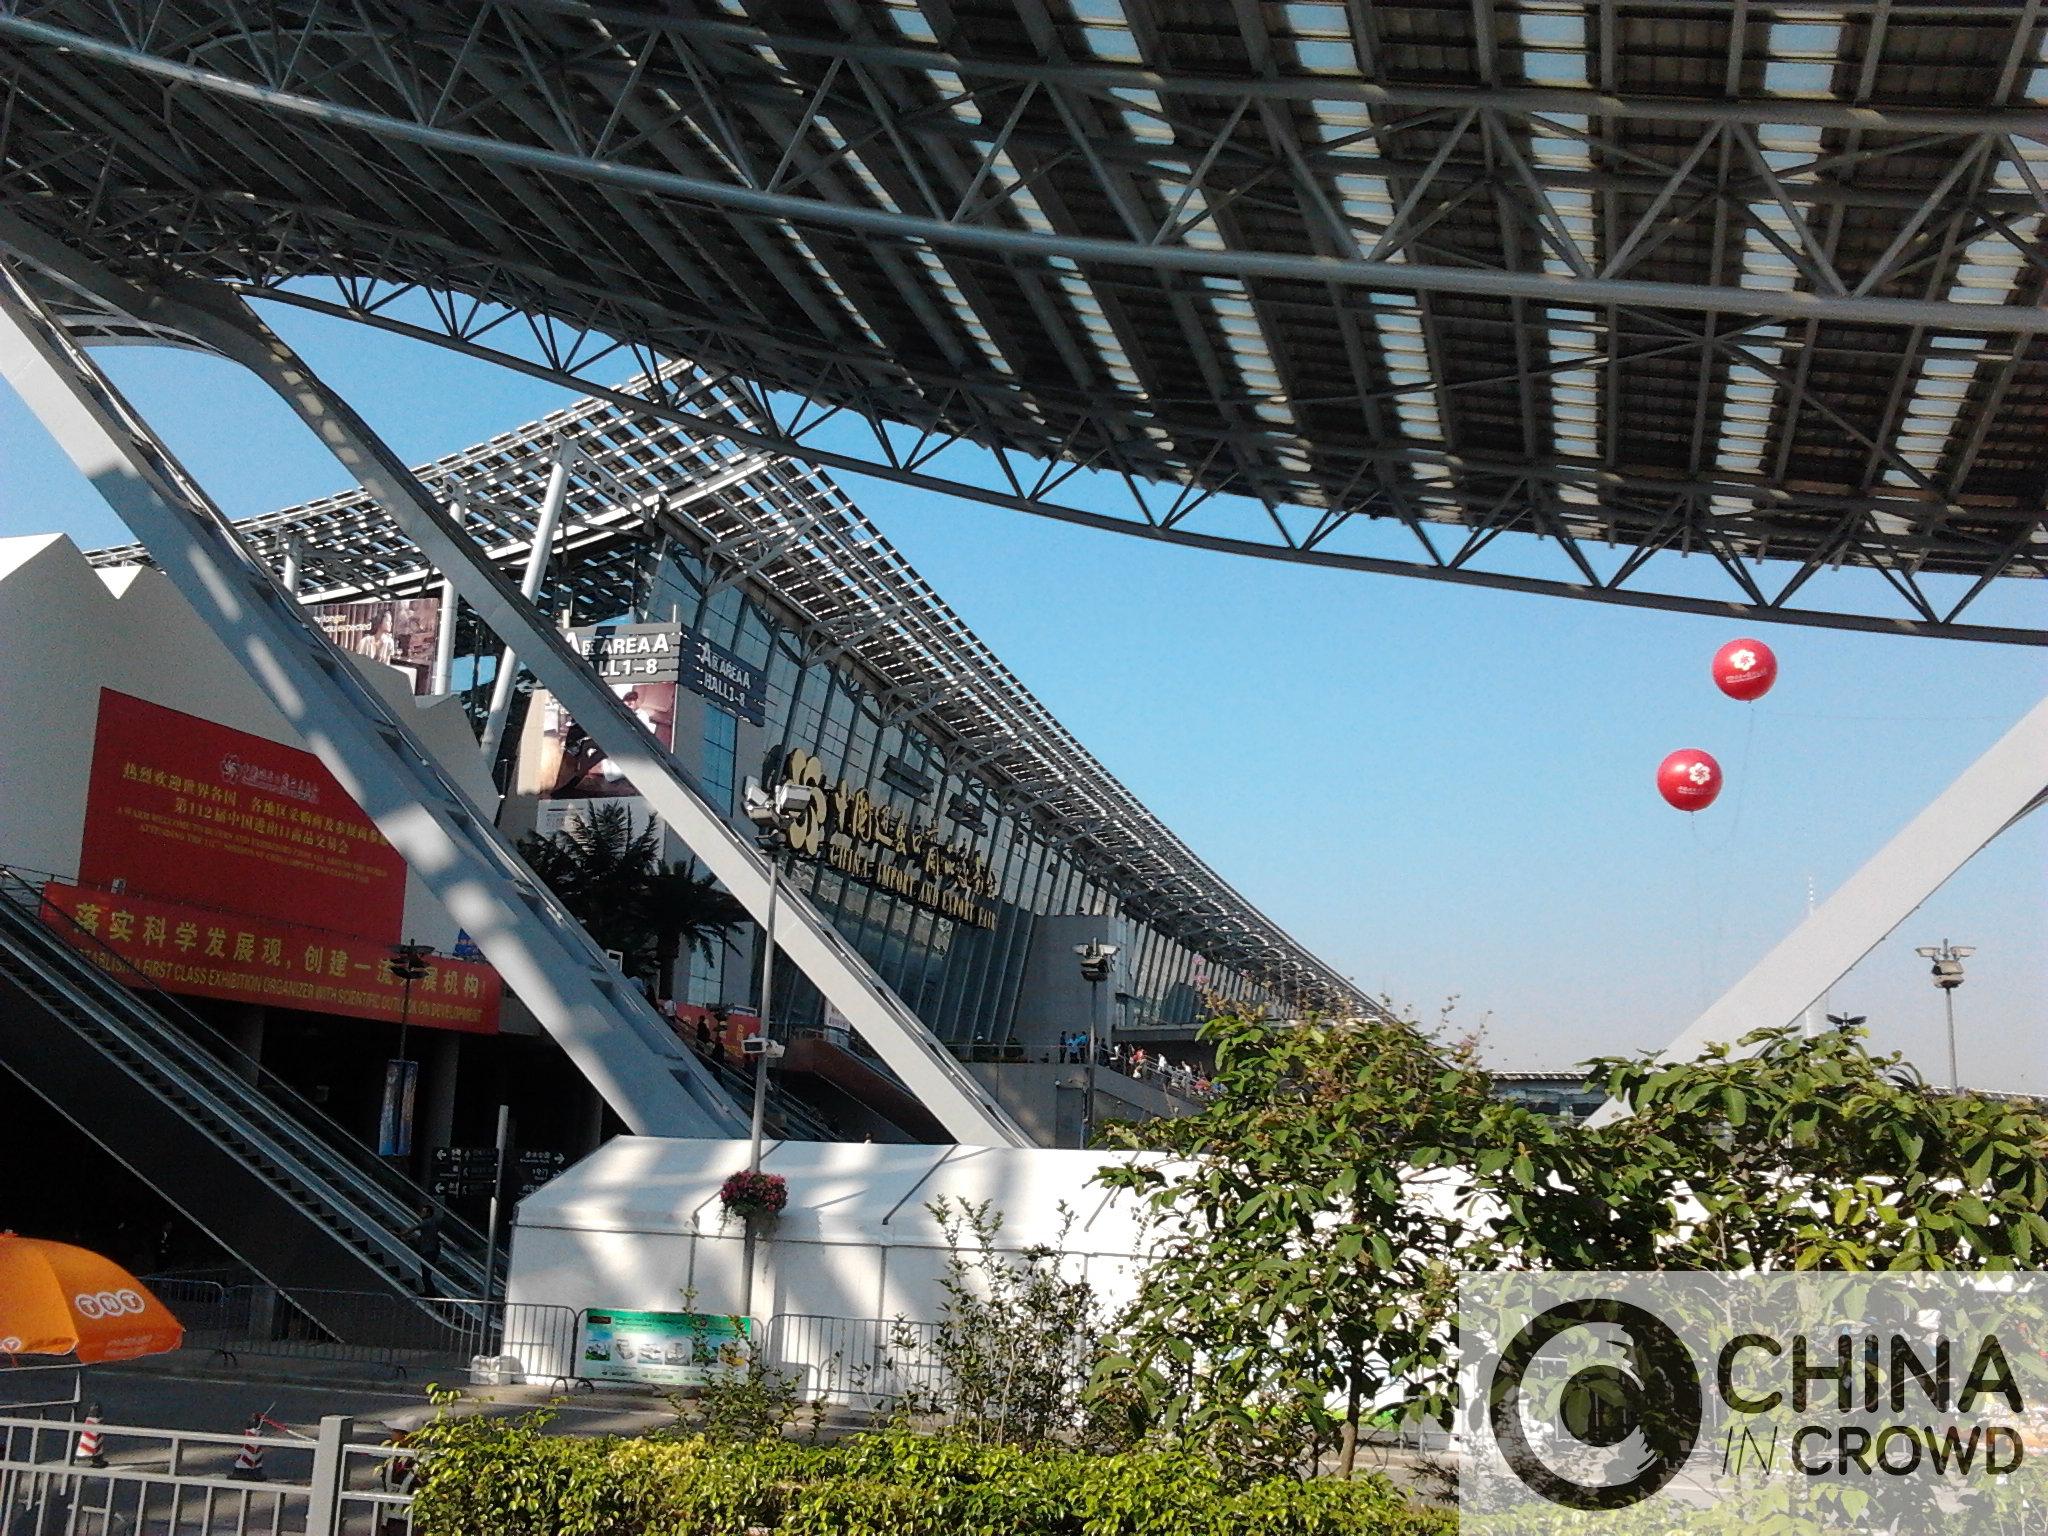 Canton fair 2011. CHINA IN CROWD